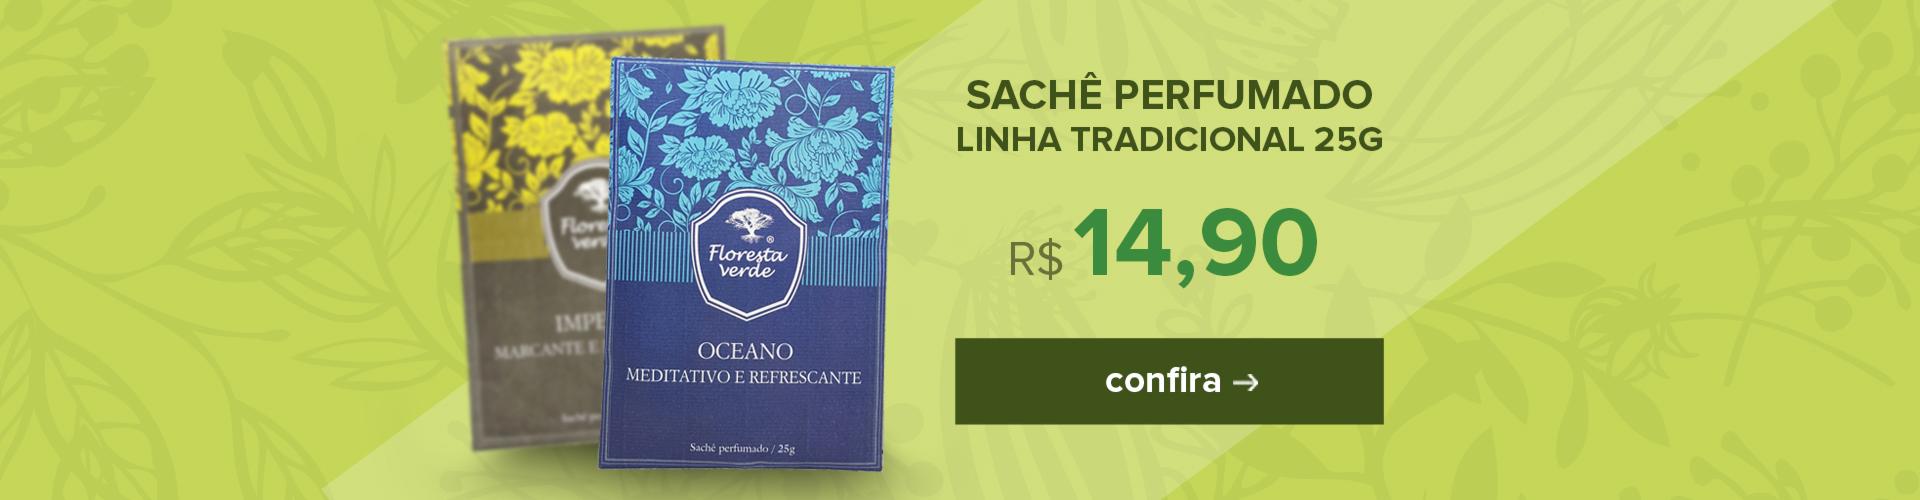 Sachê Perfumado Tradicional